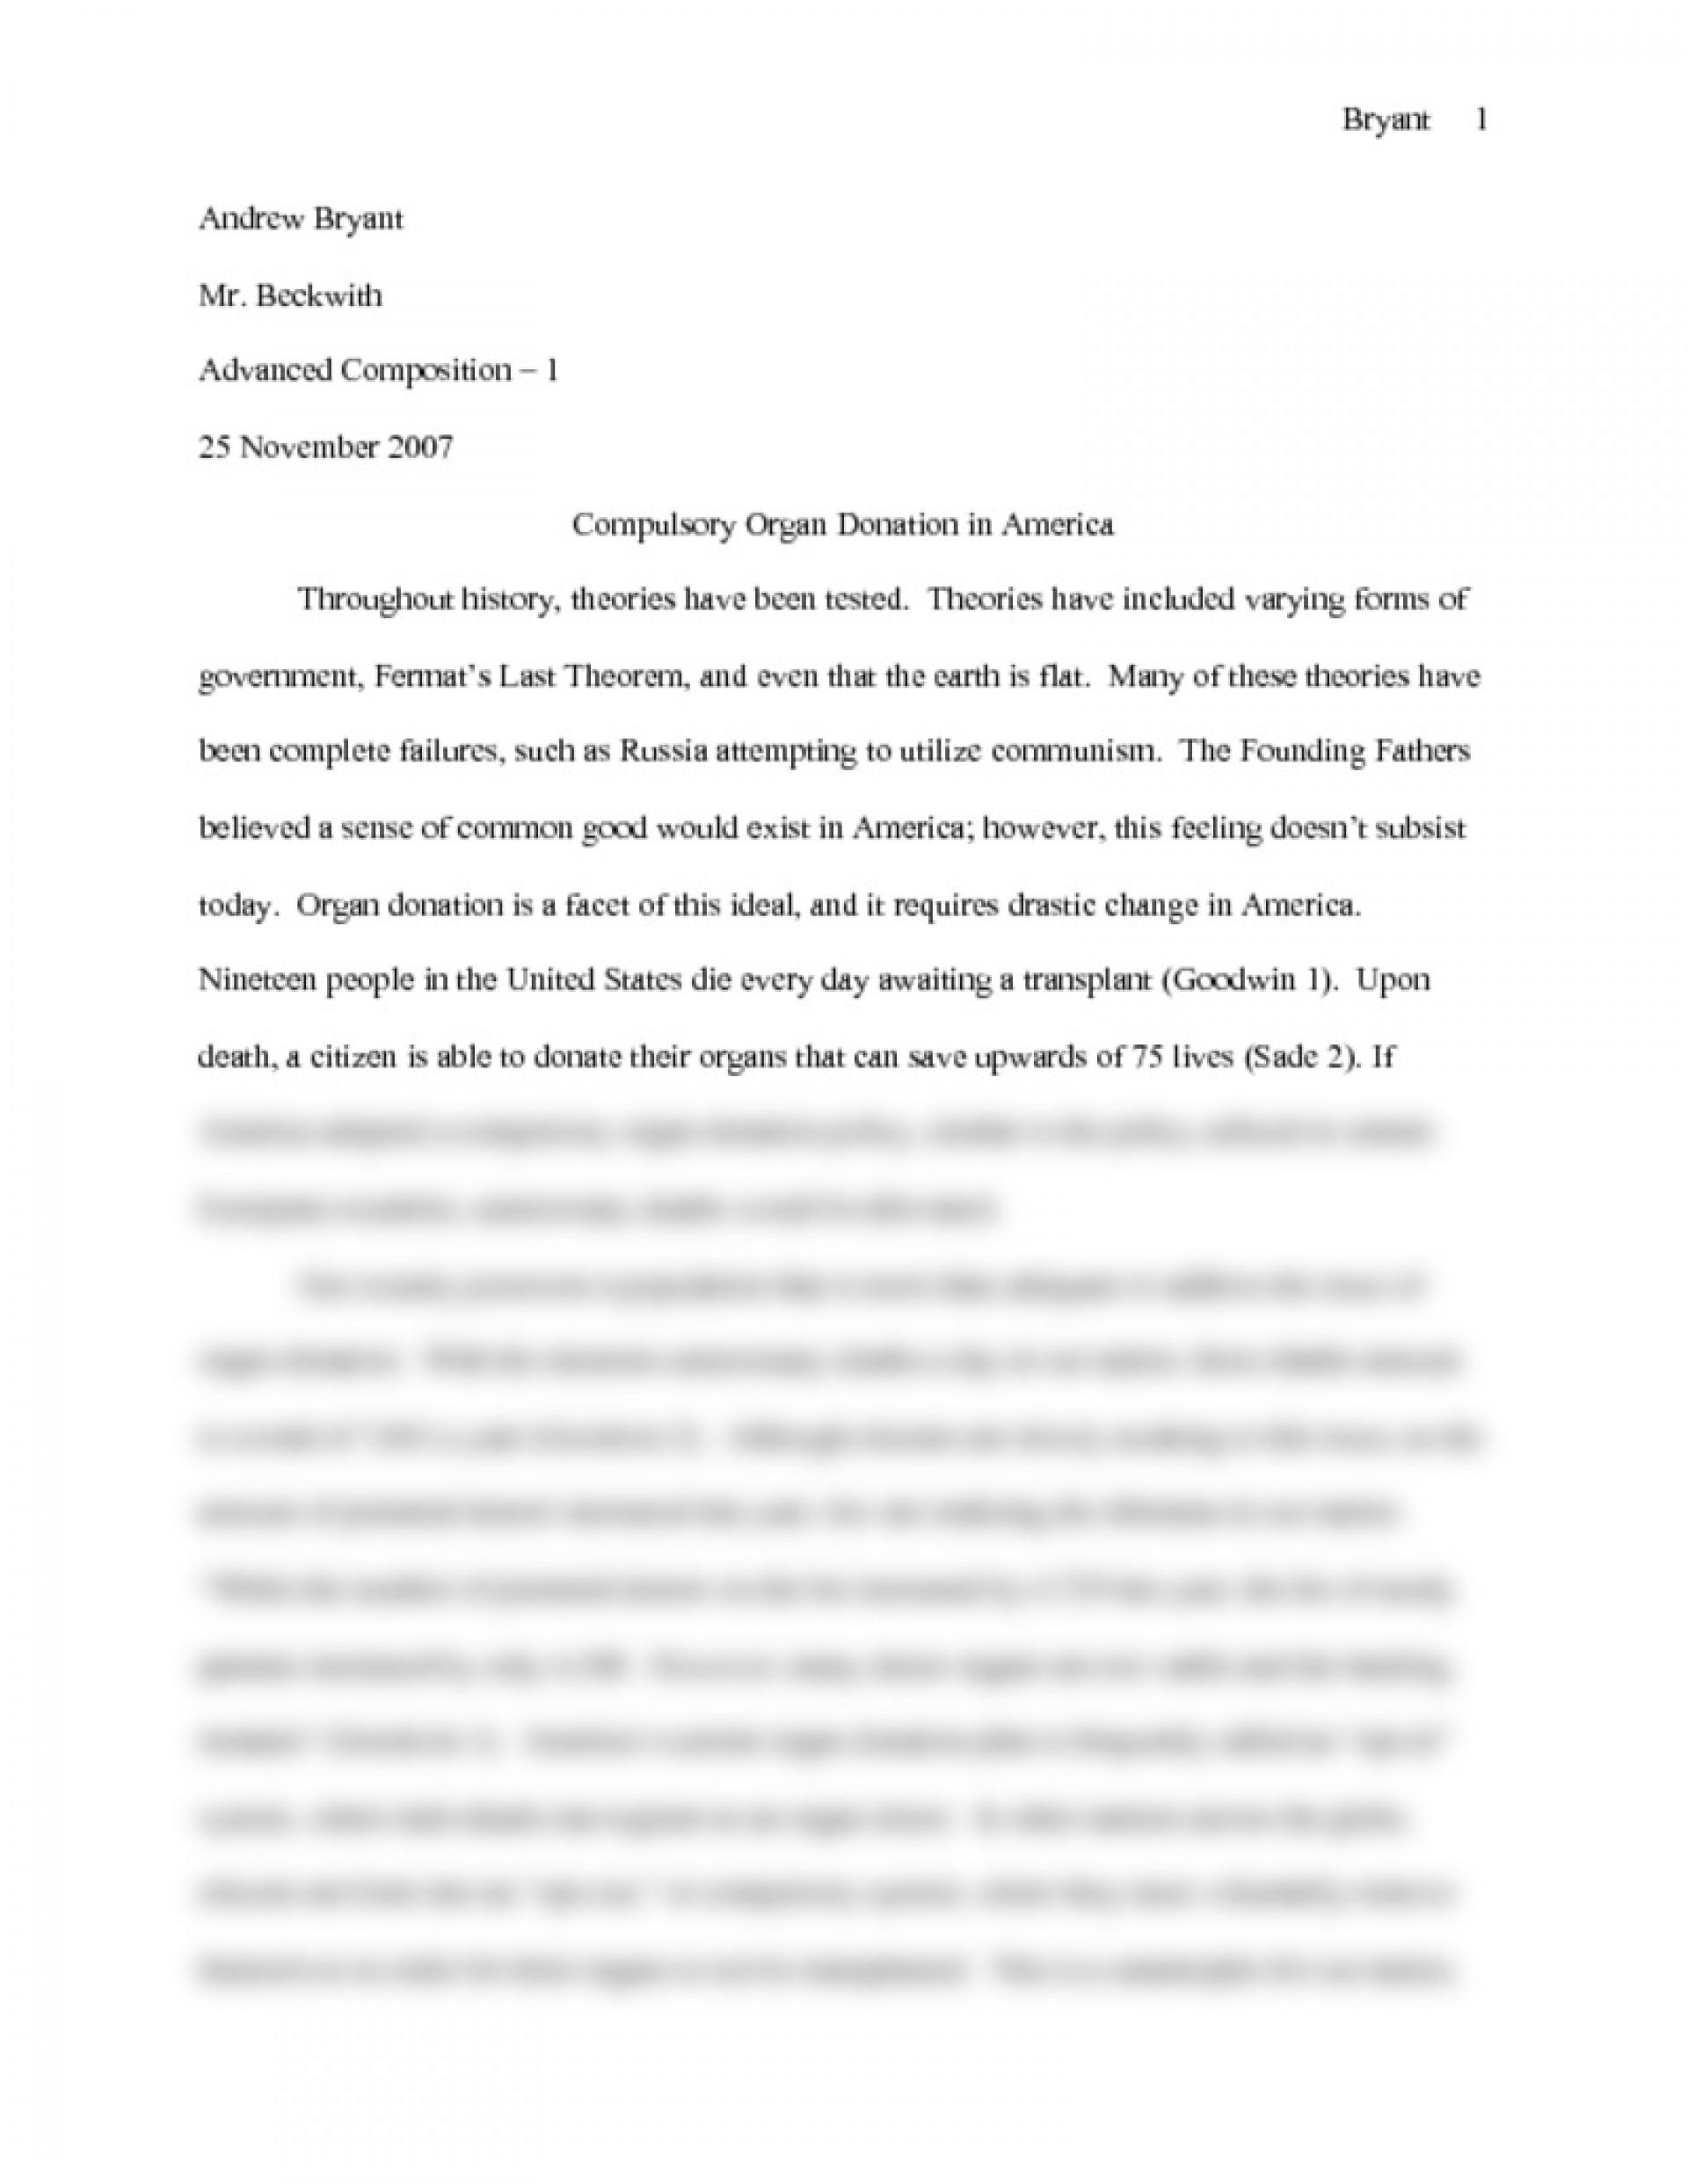 003 Preview0 Organ Donation Essay Top Transplant Argumentative Persuasive Introduction Outline 1920